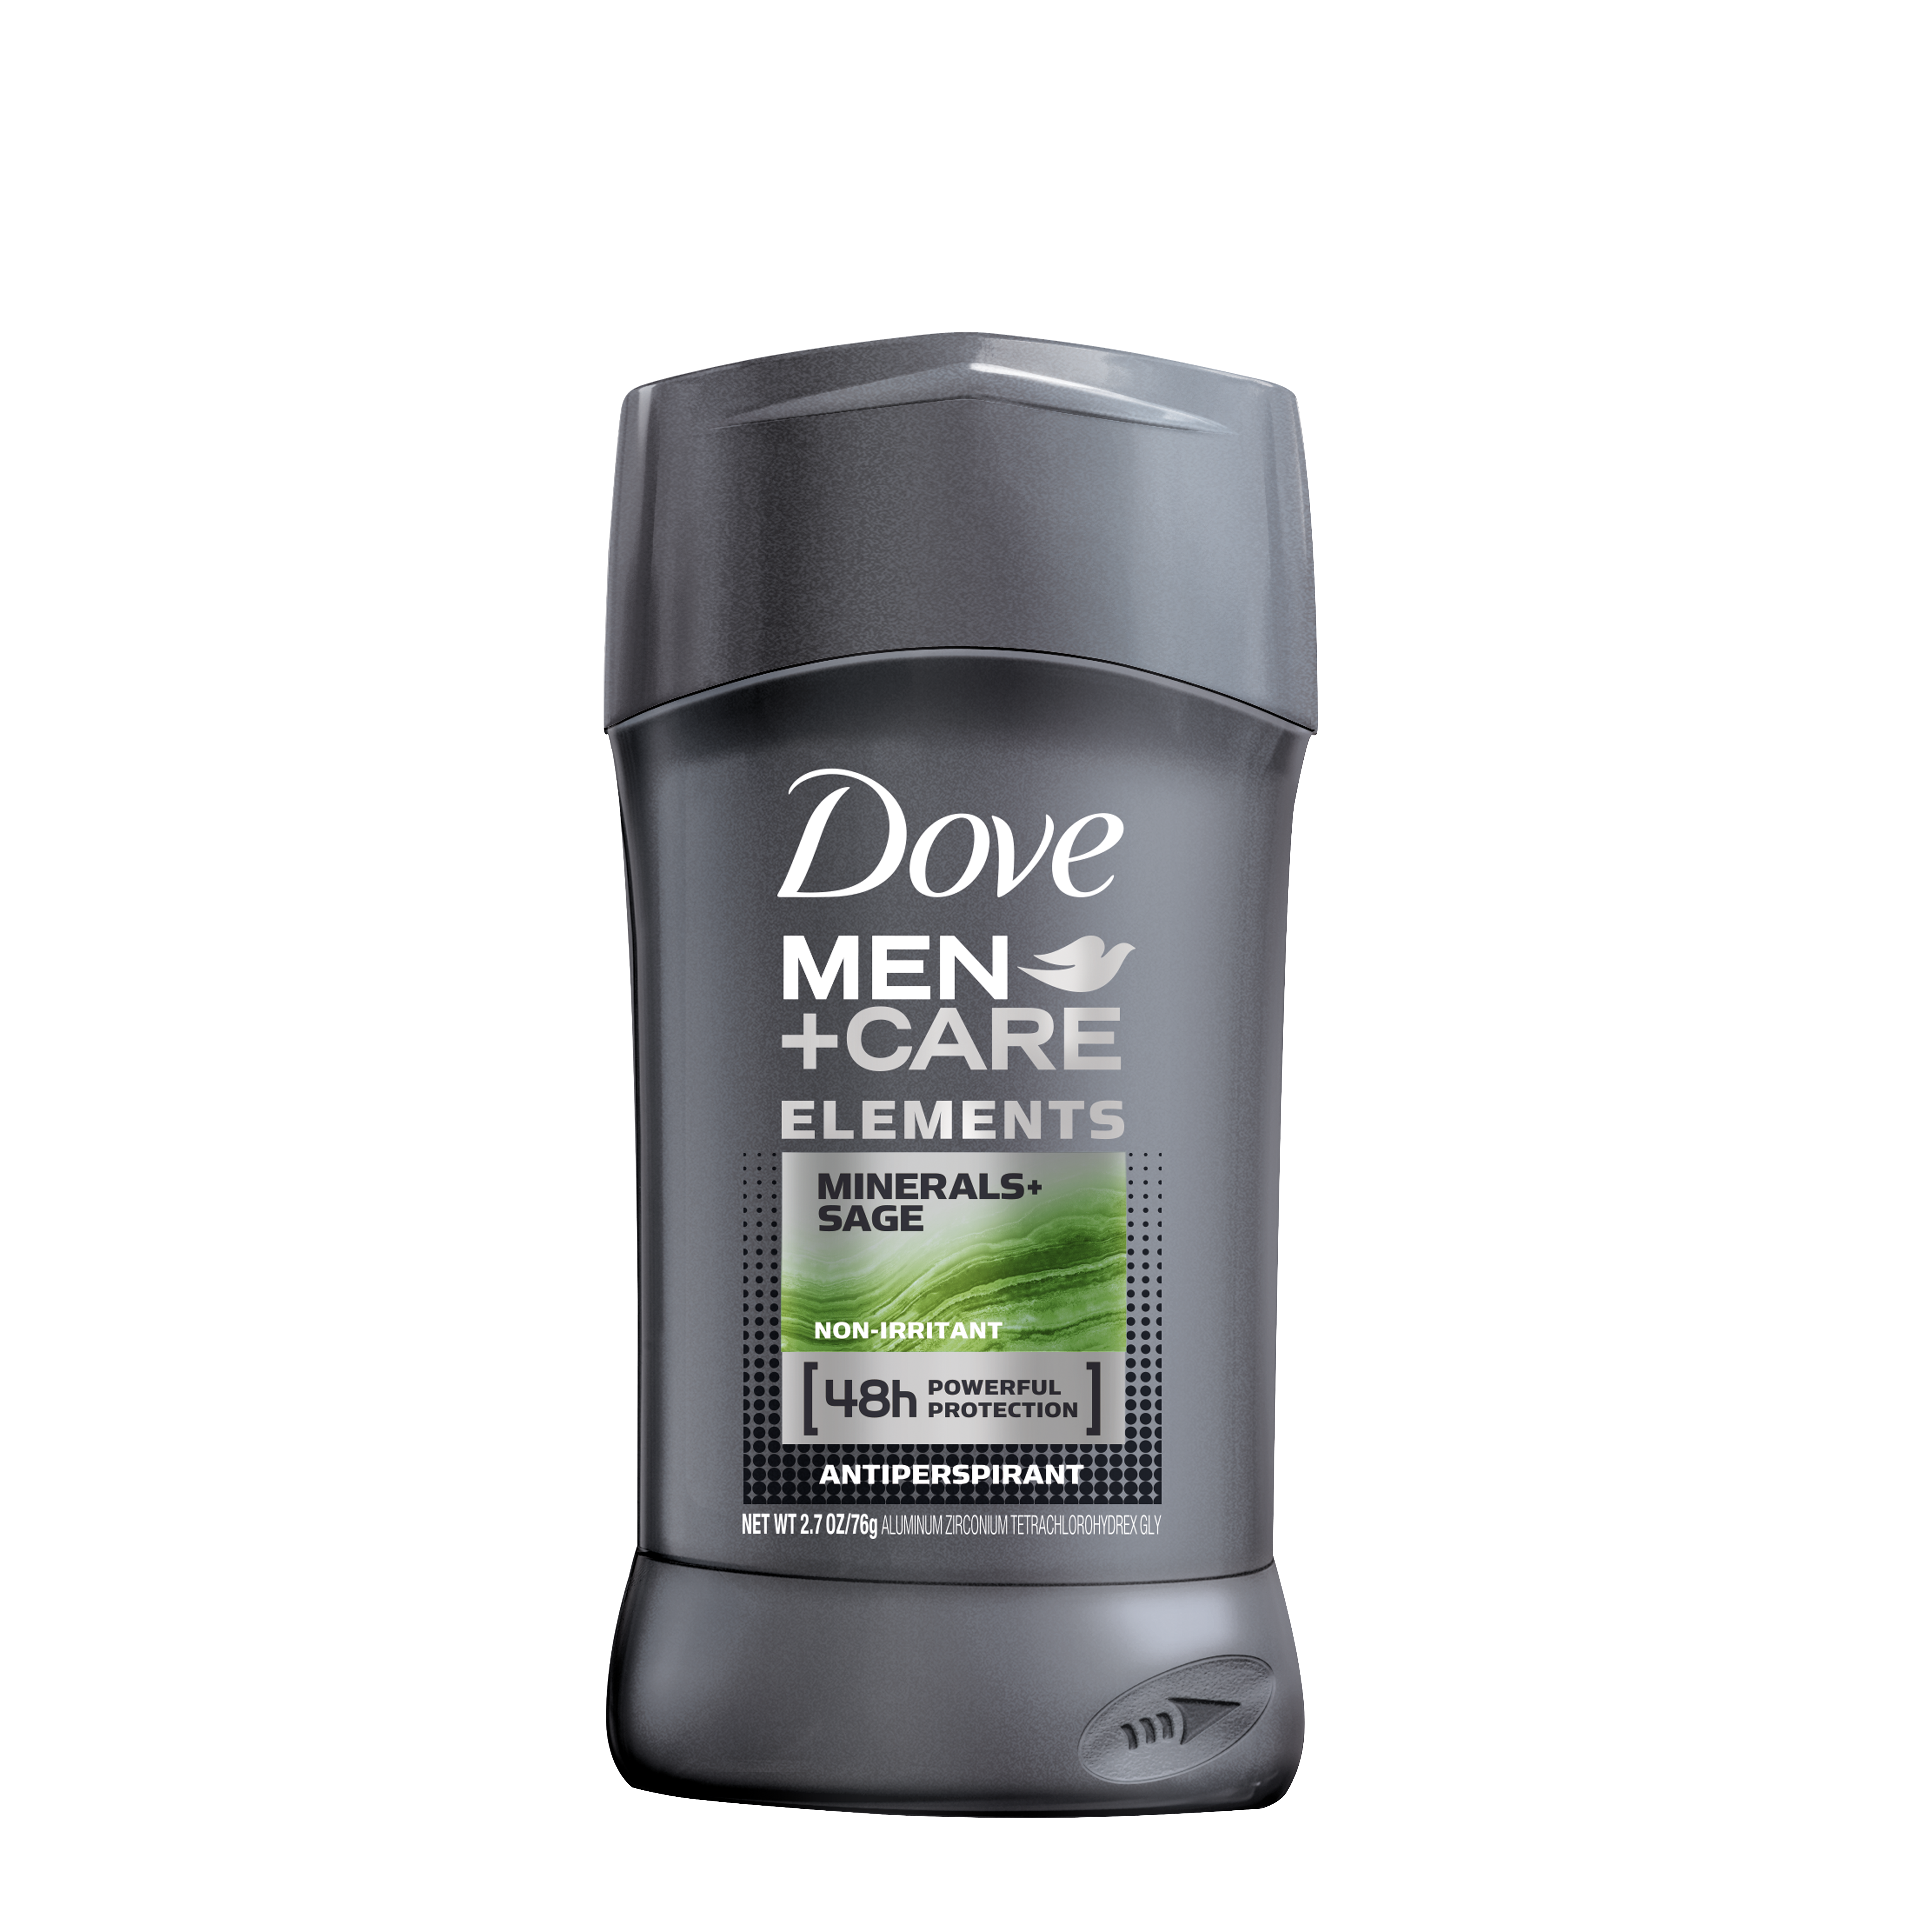 Men Care Elements Minerals Sage Antiperspirant Deodorant